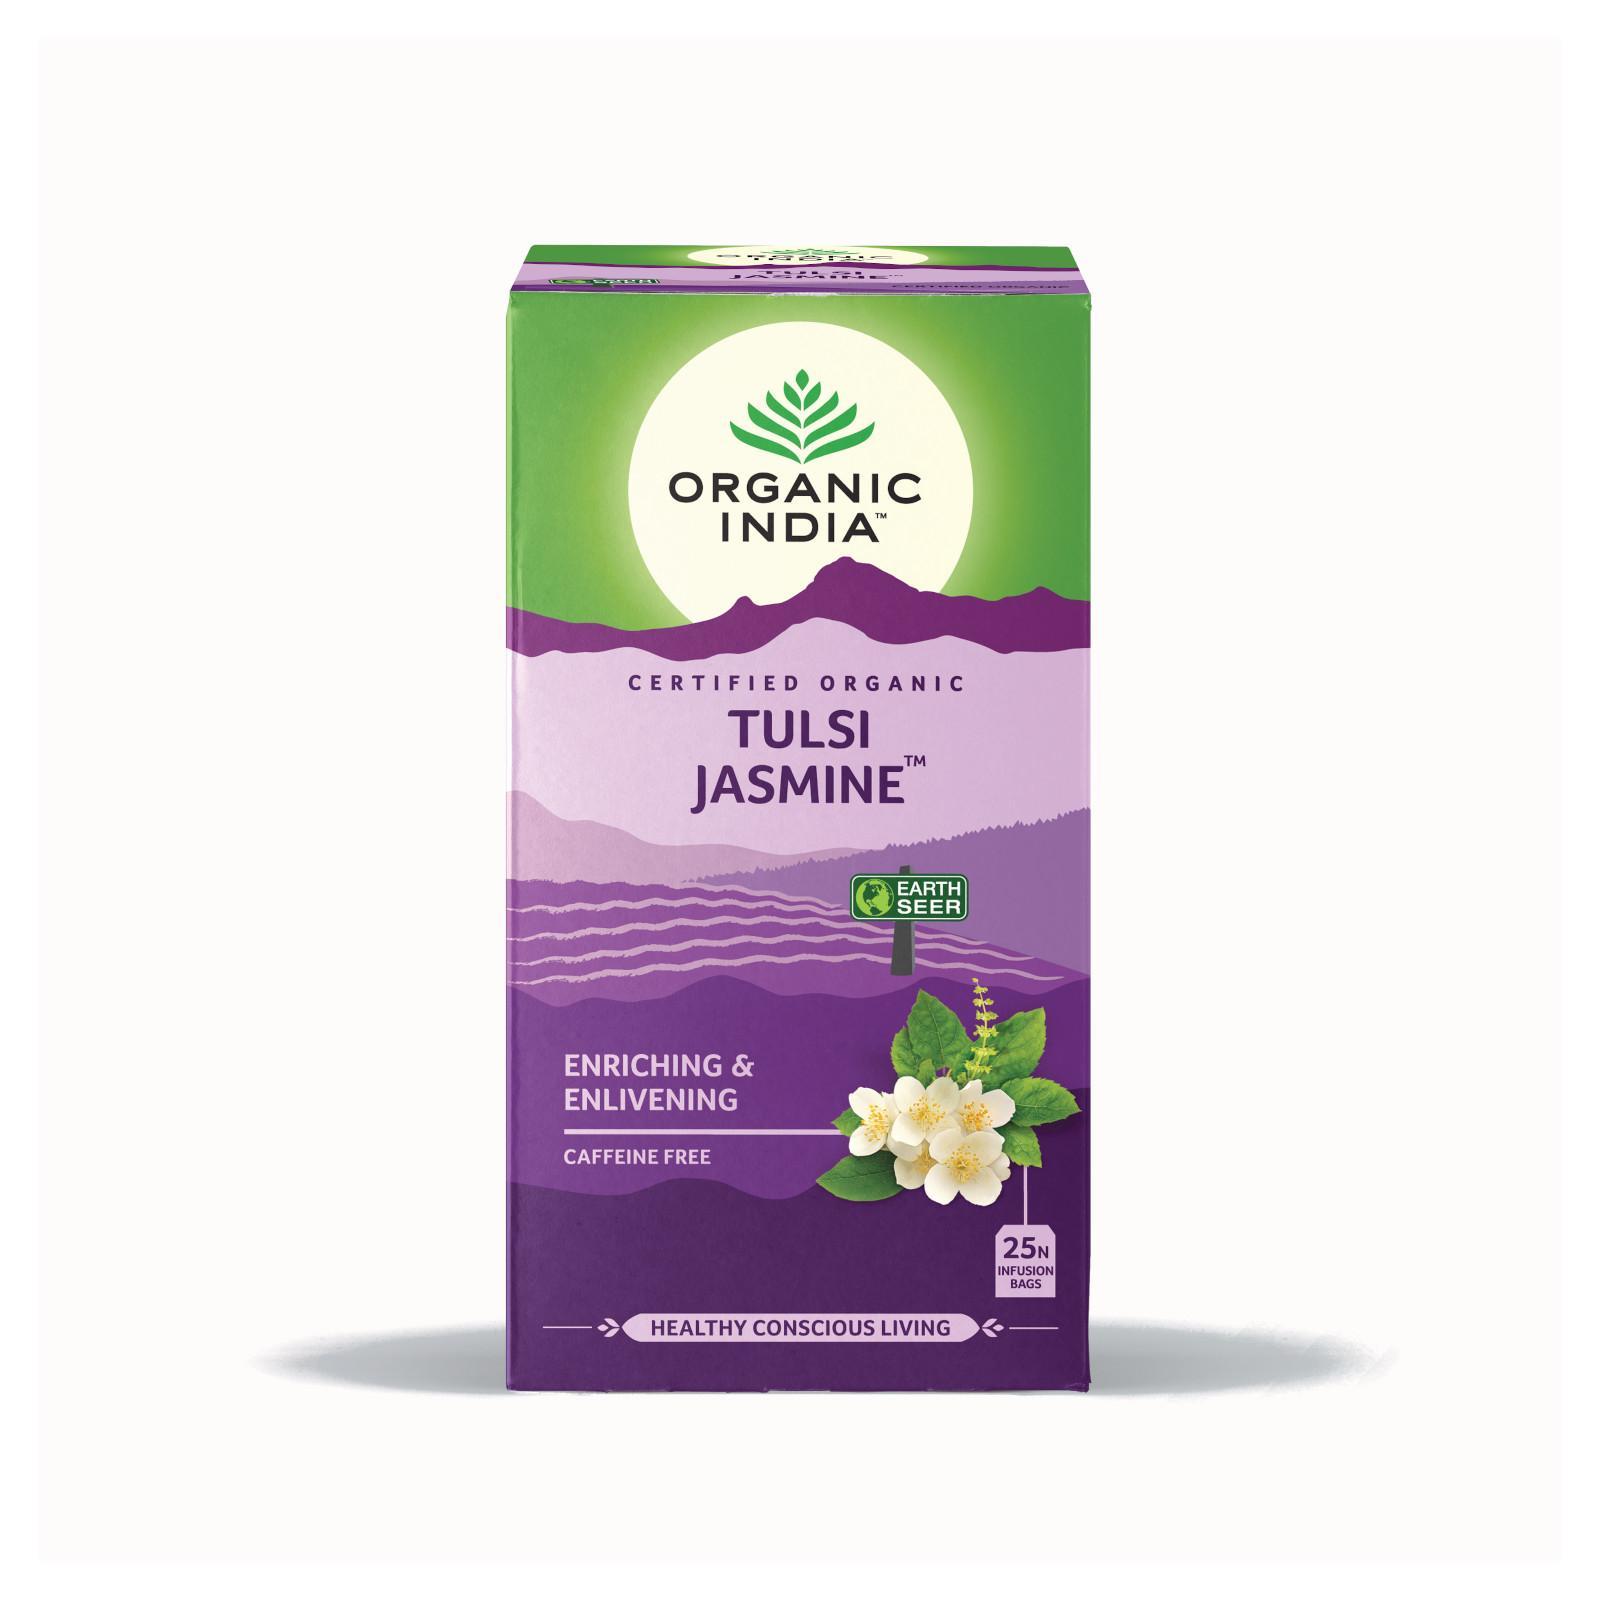 Organic India Čaj Tulsi Jasmine, porcovaný 18 ks, 30,6 g